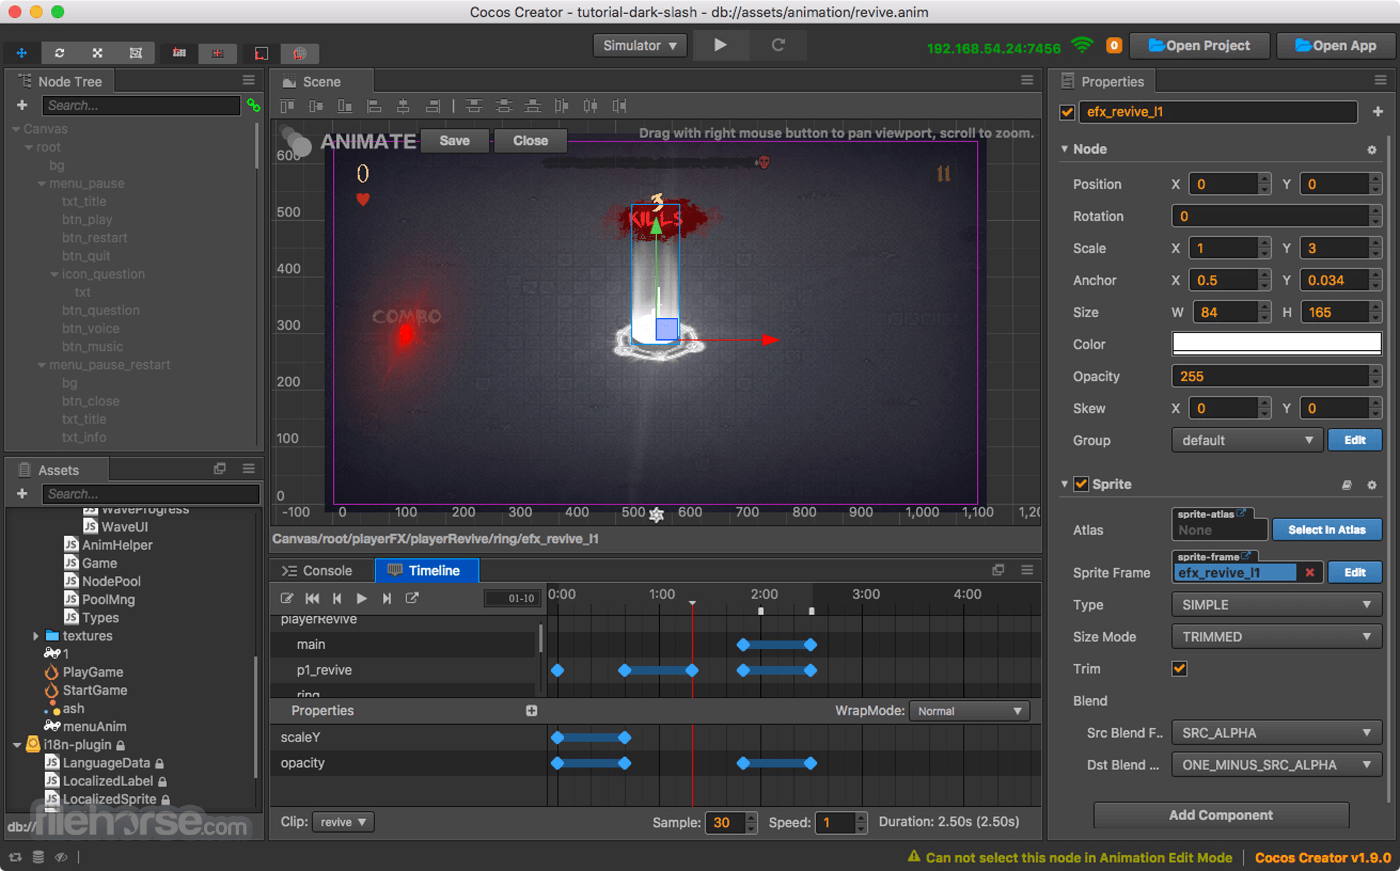 Cocos Creator 2.4.2 Screenshot 1